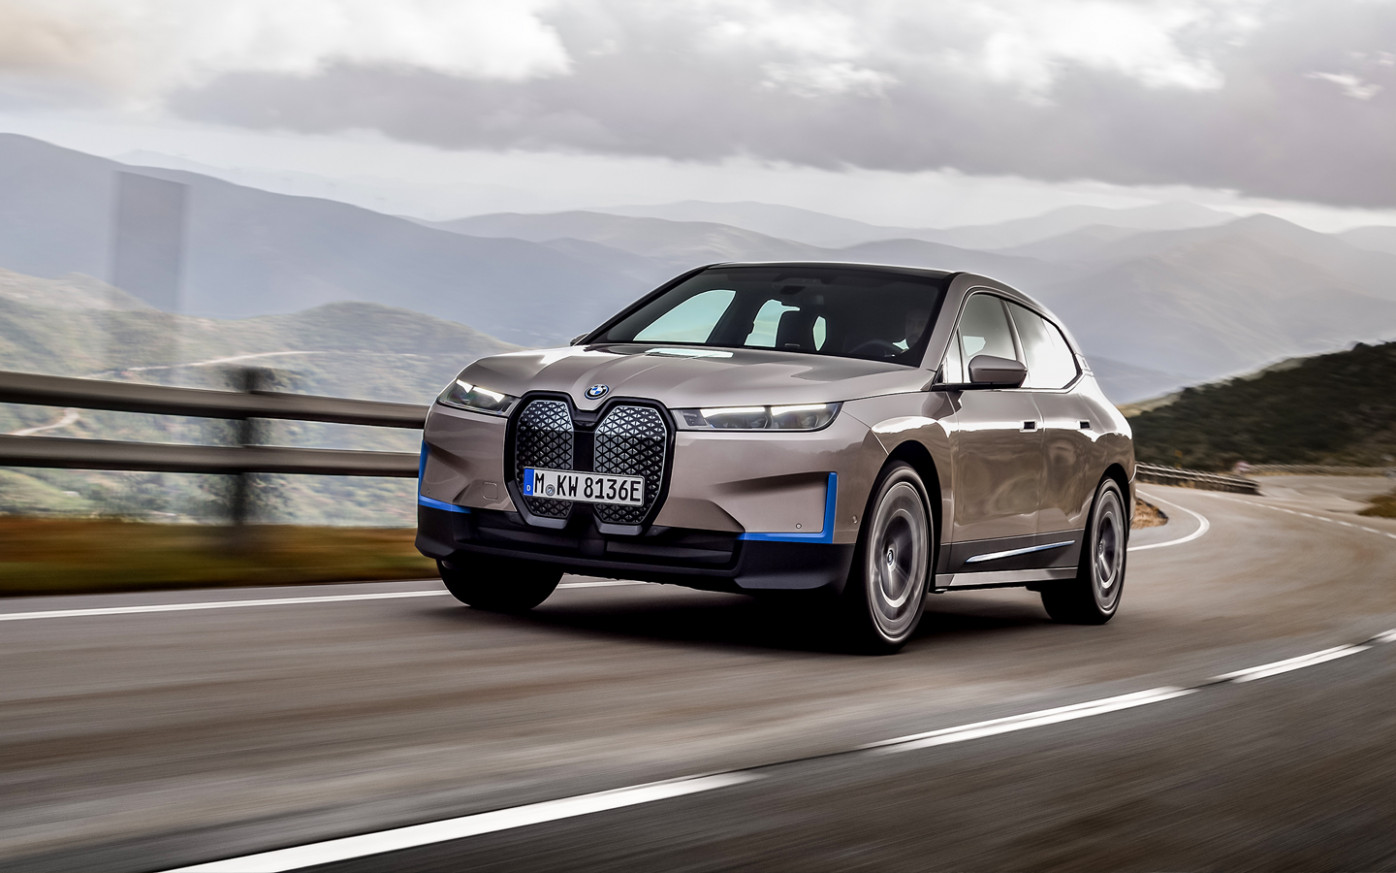 New Concept BMW En 2022